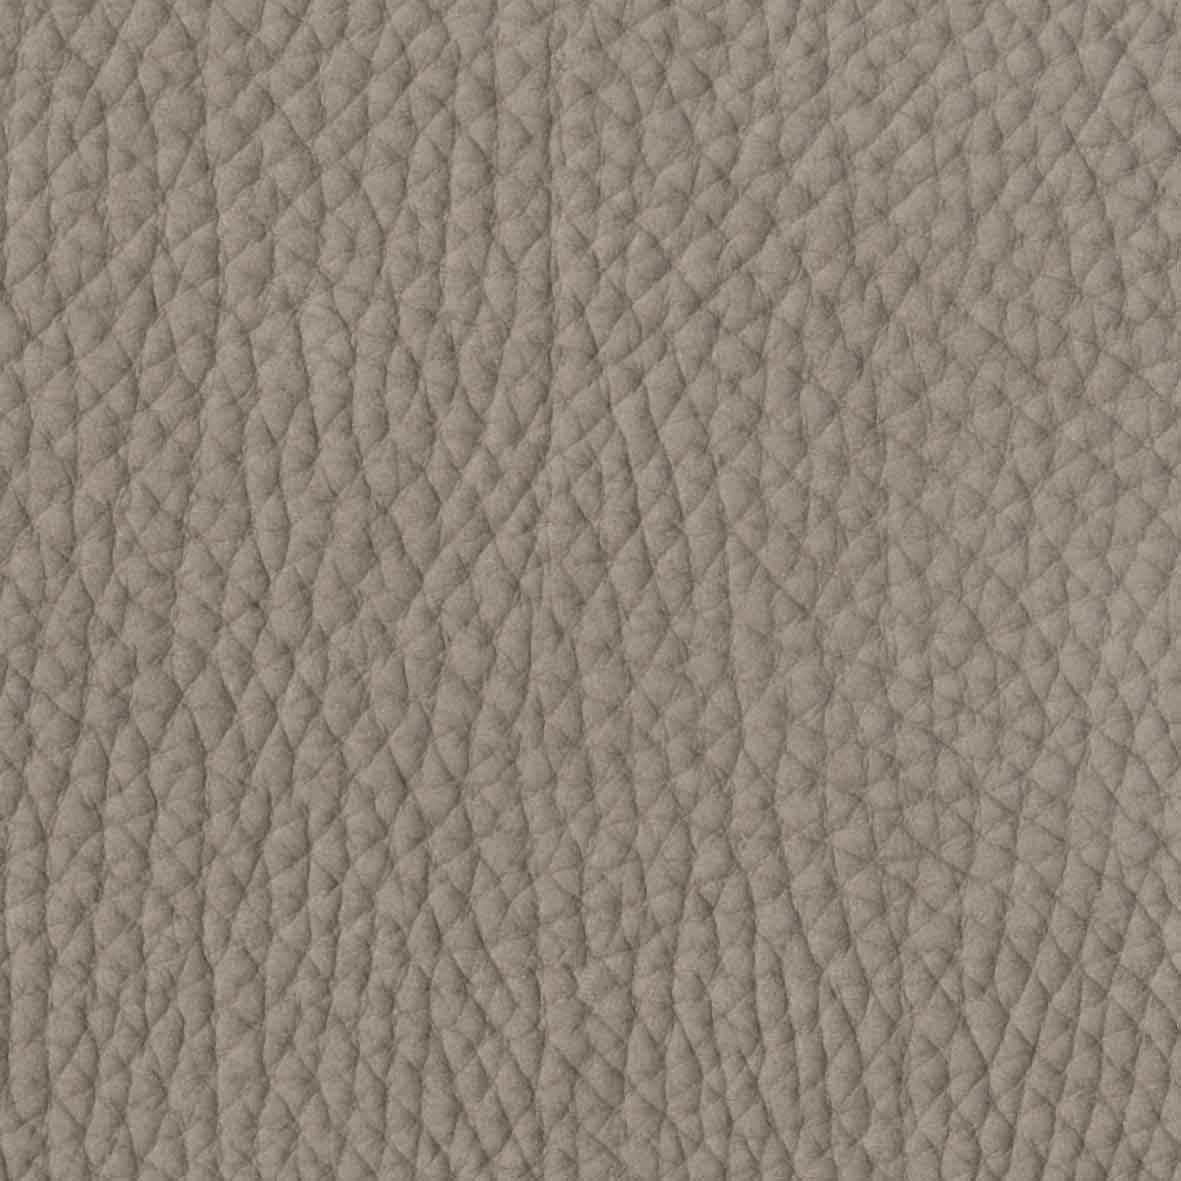 01 Sabbia